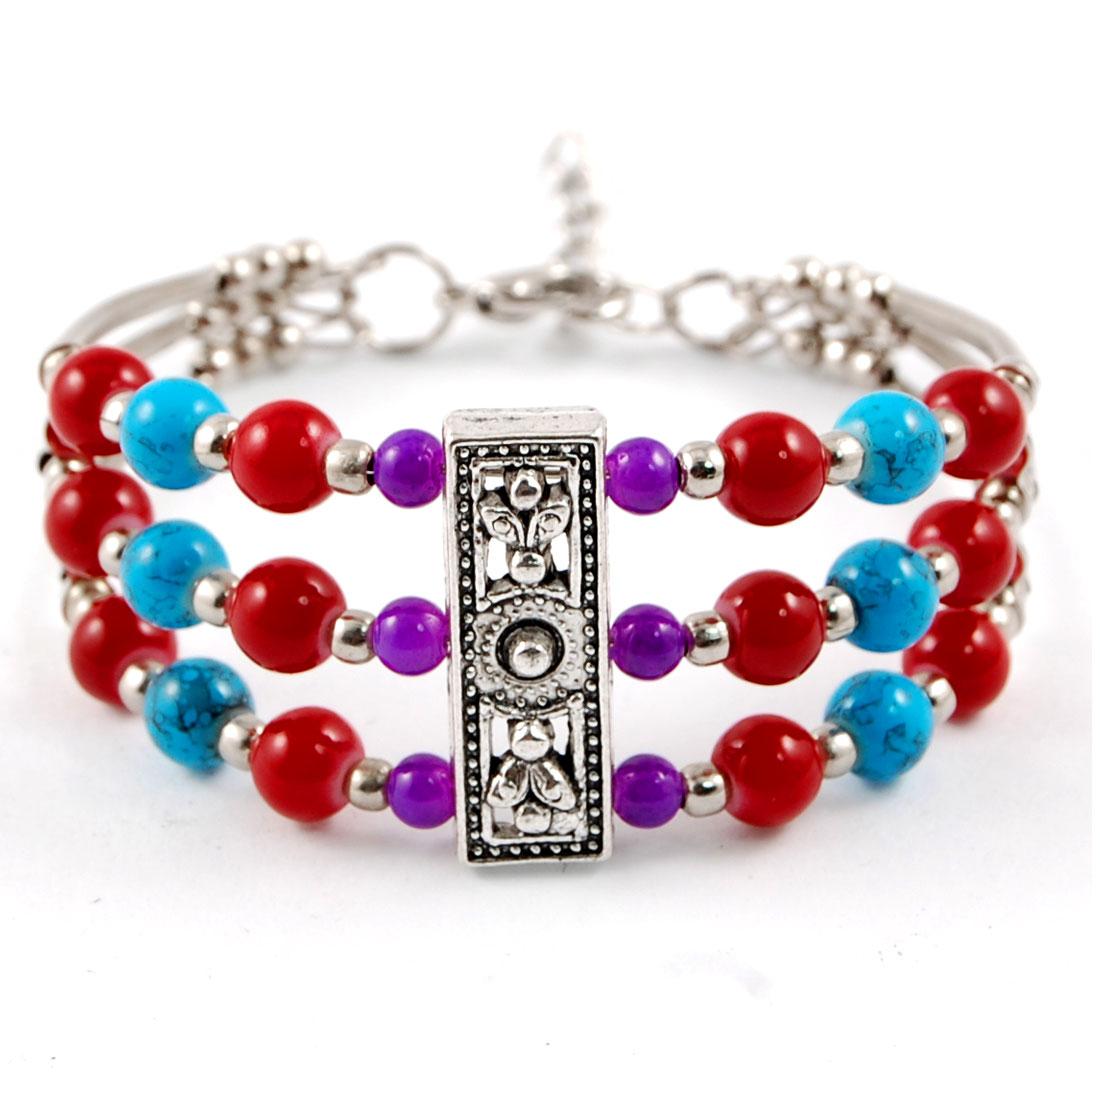 Lobster Clasp Multilayer 4 Colors Round Bead Wrist Bracelet Bangle